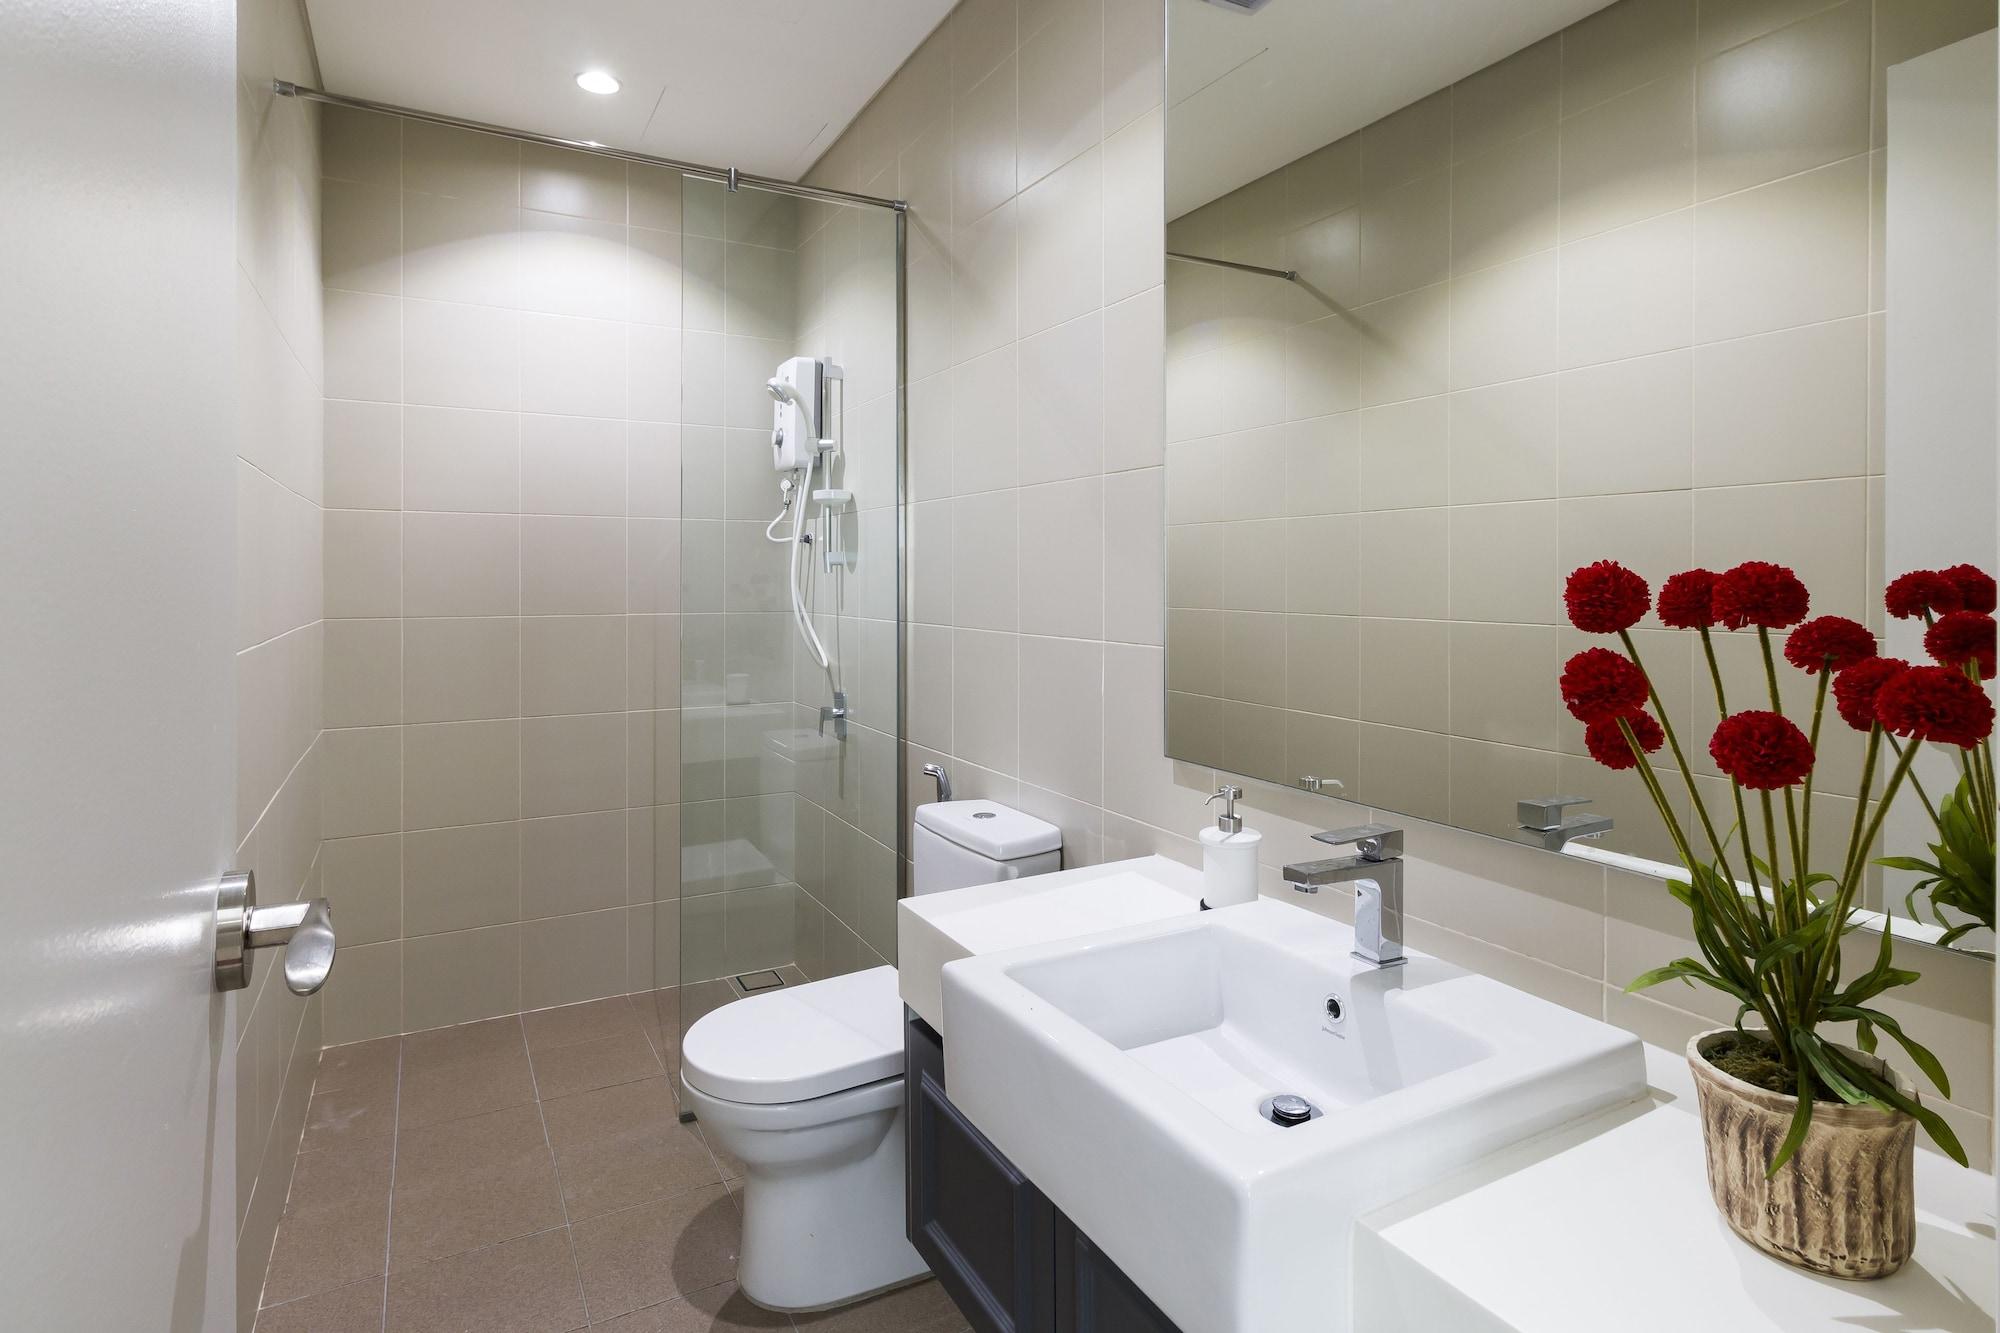 Luxury Suite Icity Shah Alam, Kuala Lumpur